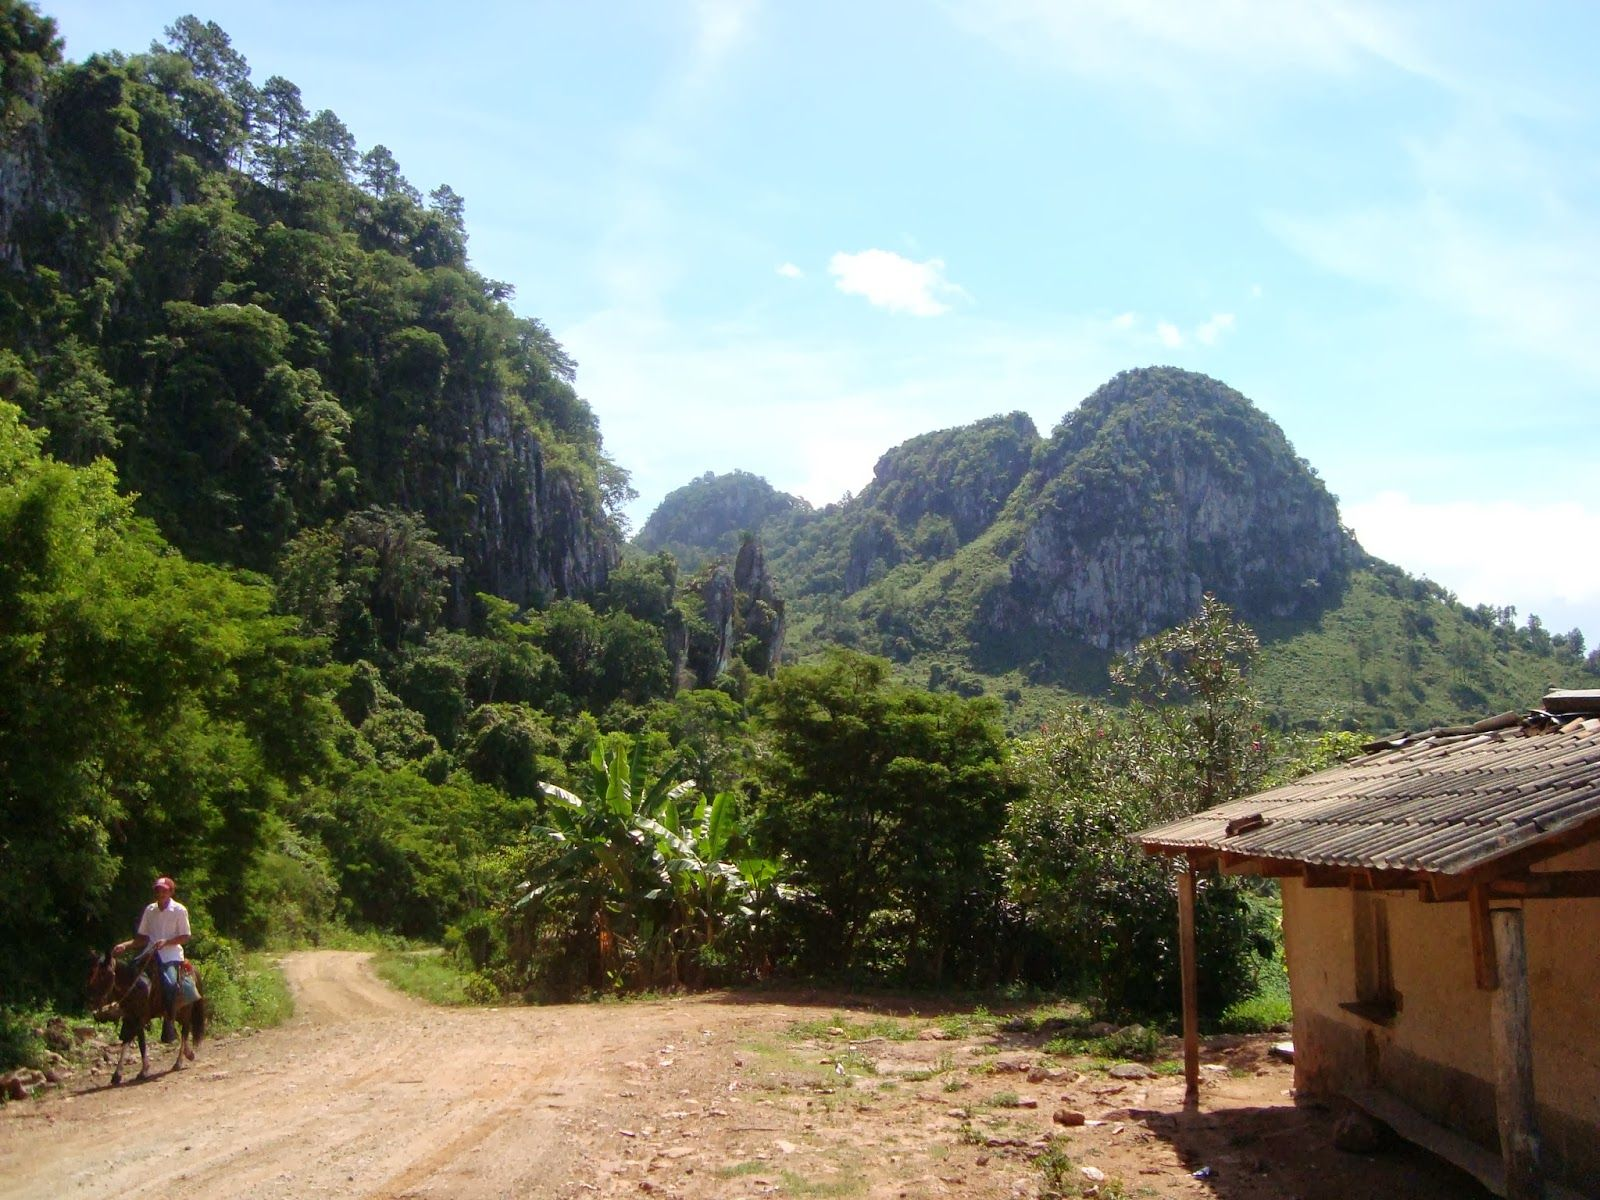 Montaña en el departamento de Yoro, Honduras   Natural landmarks,  Landscape, Honduras